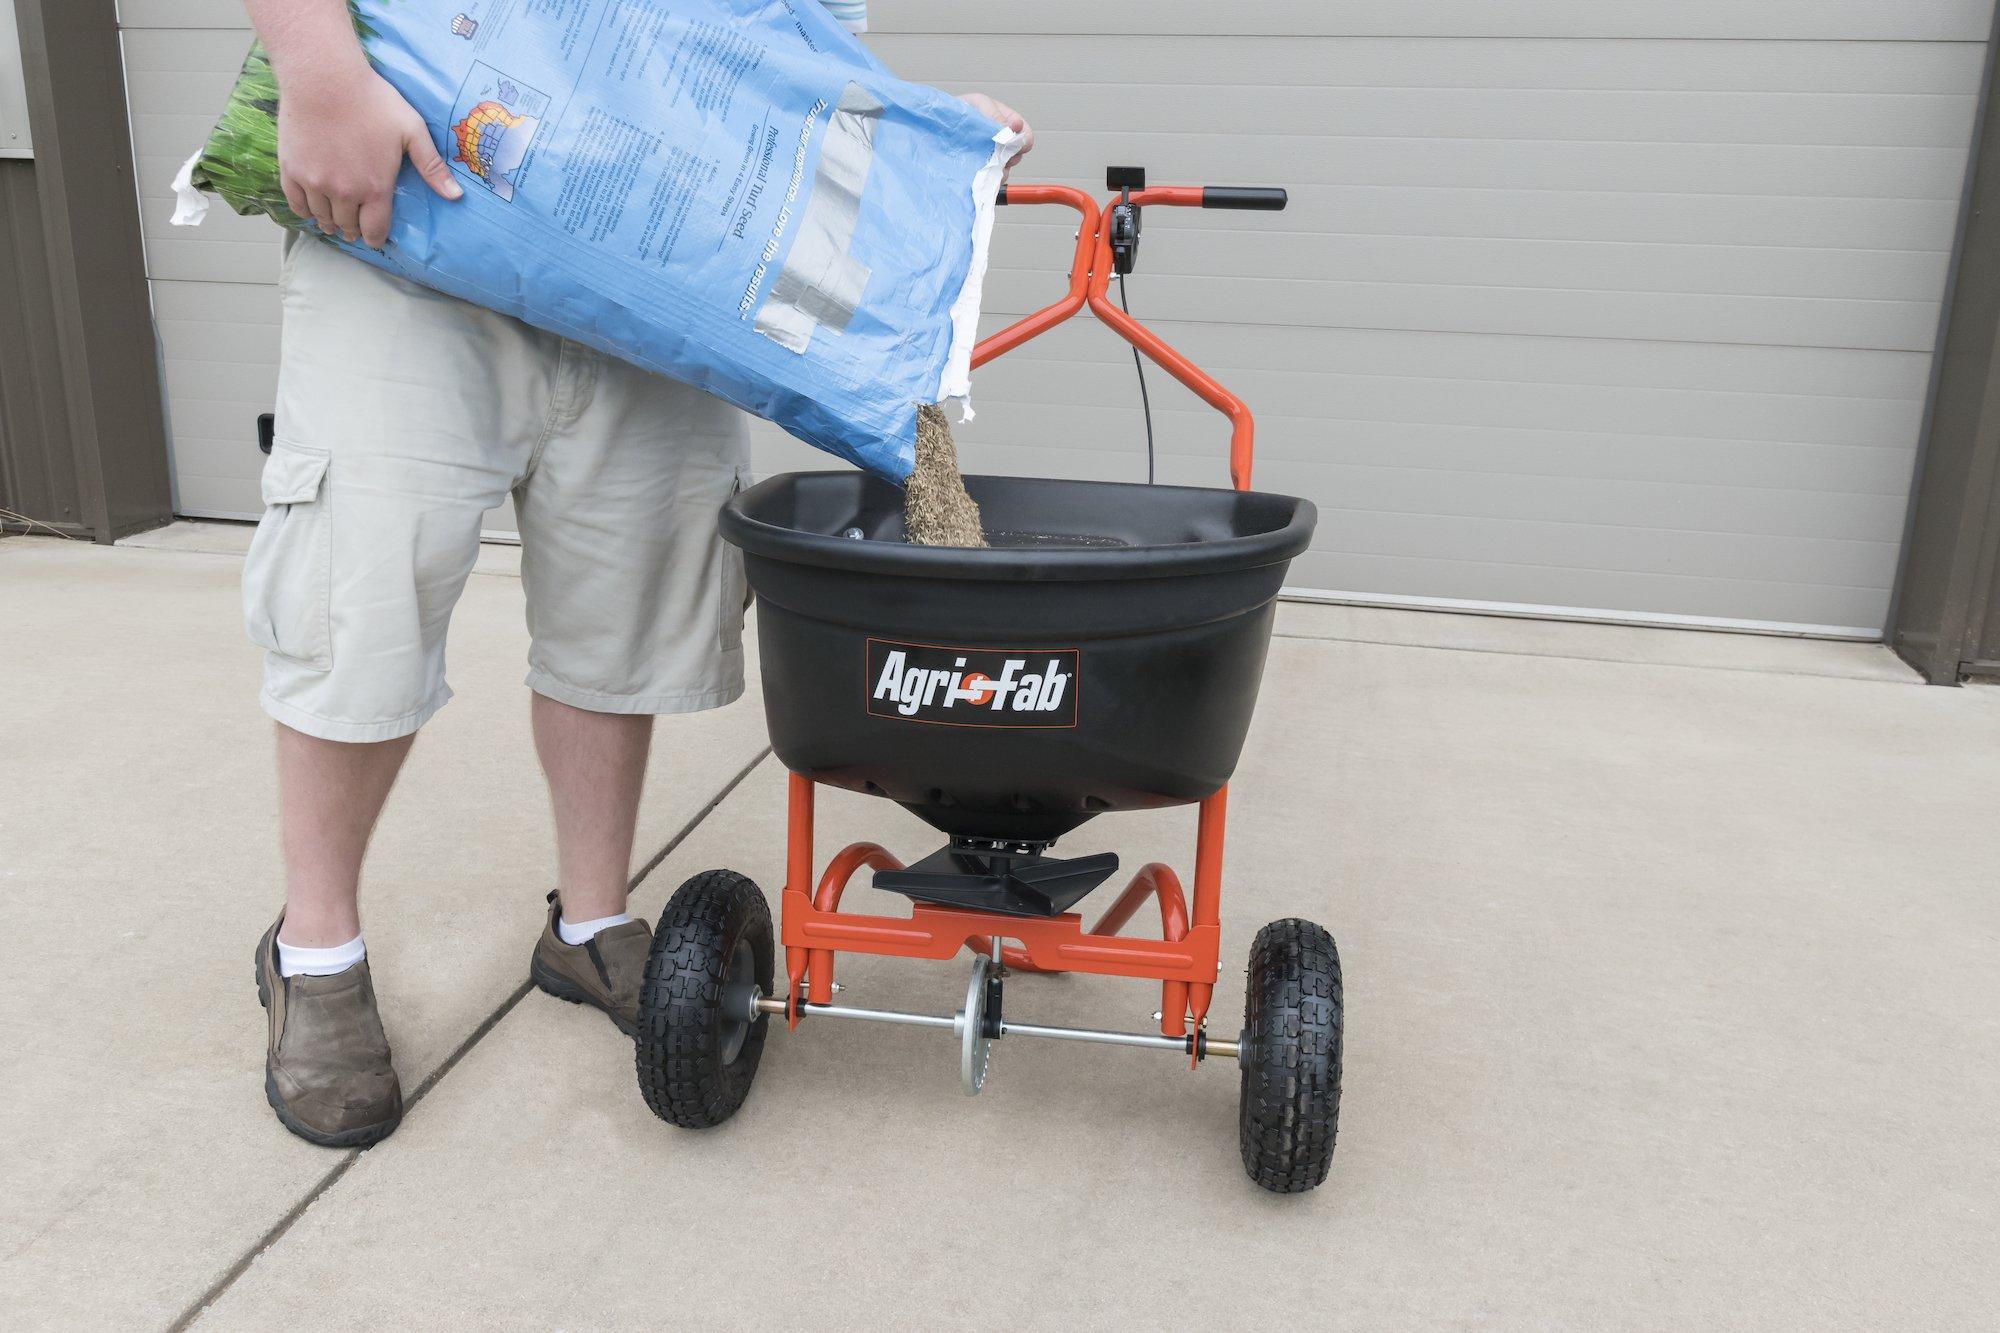 Agri-Fab Broadcast Spreader, 110 lb Capacity, Orange/Black